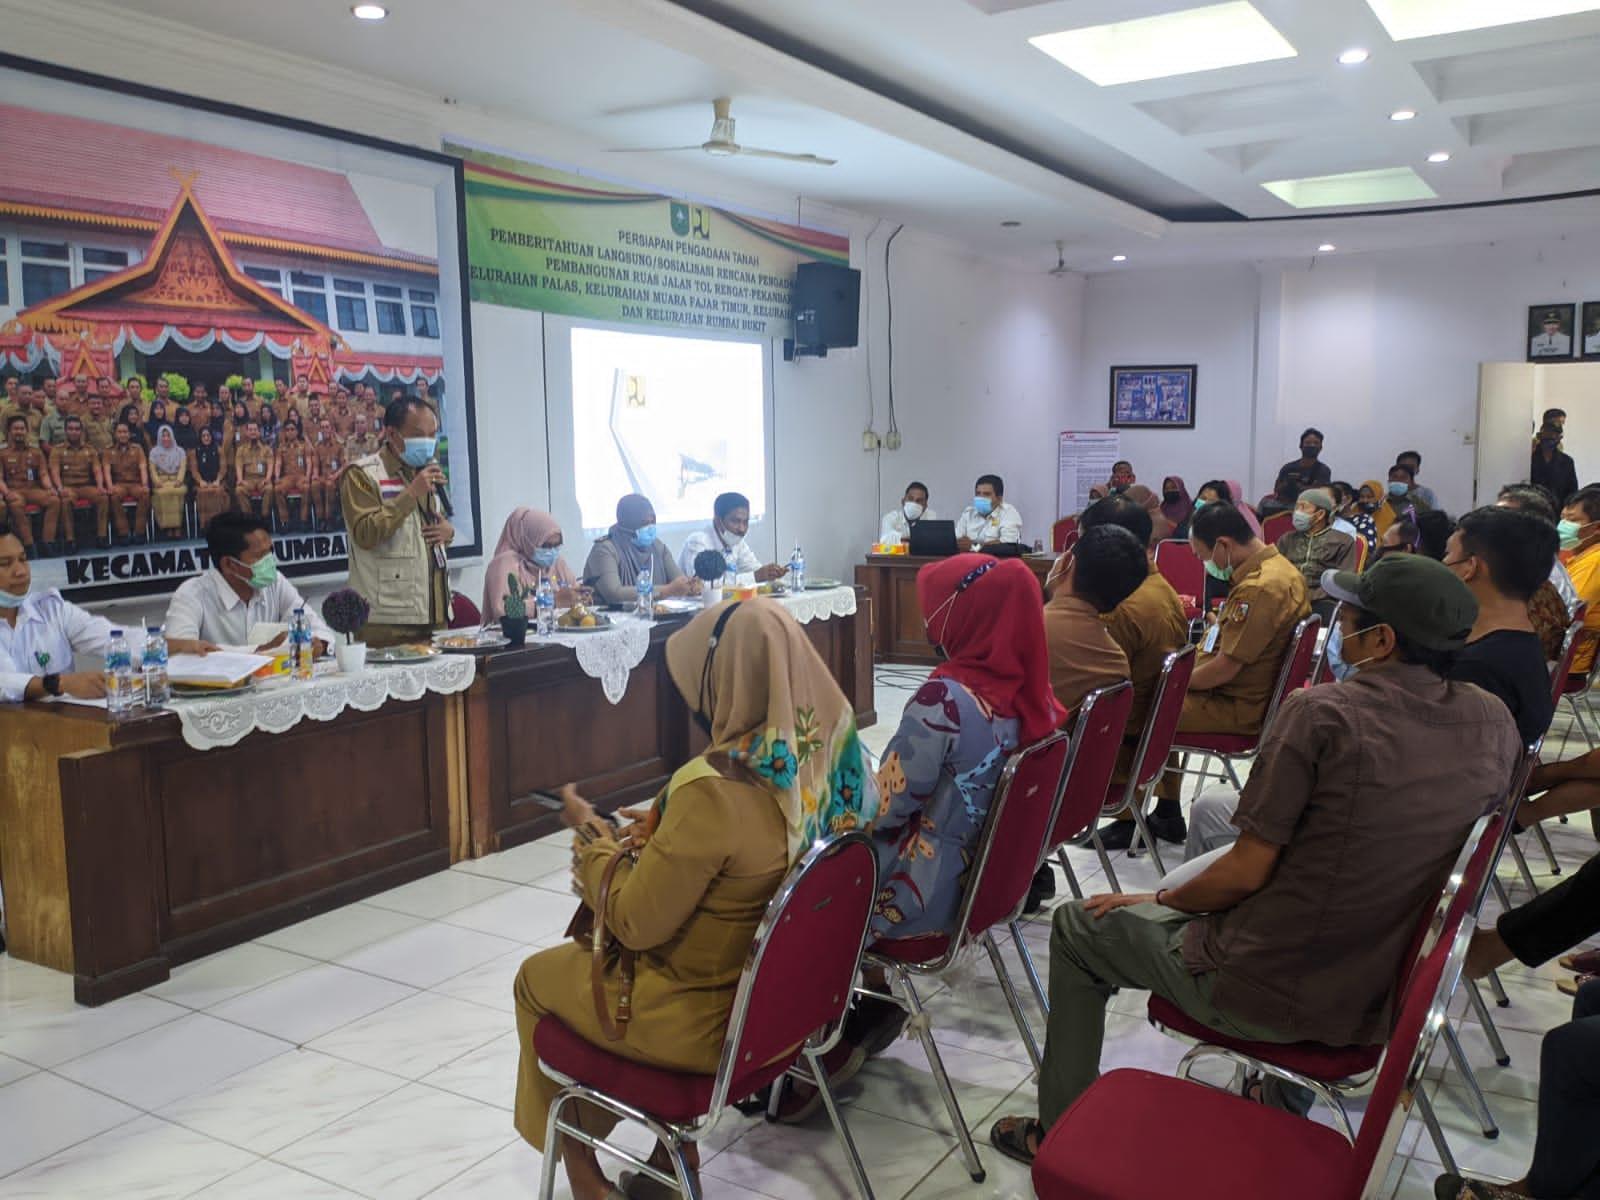 Image : Kecamatan Rumbai Barat Sosialisasikan Pembangunan Tol Pekanbaru-Rengat